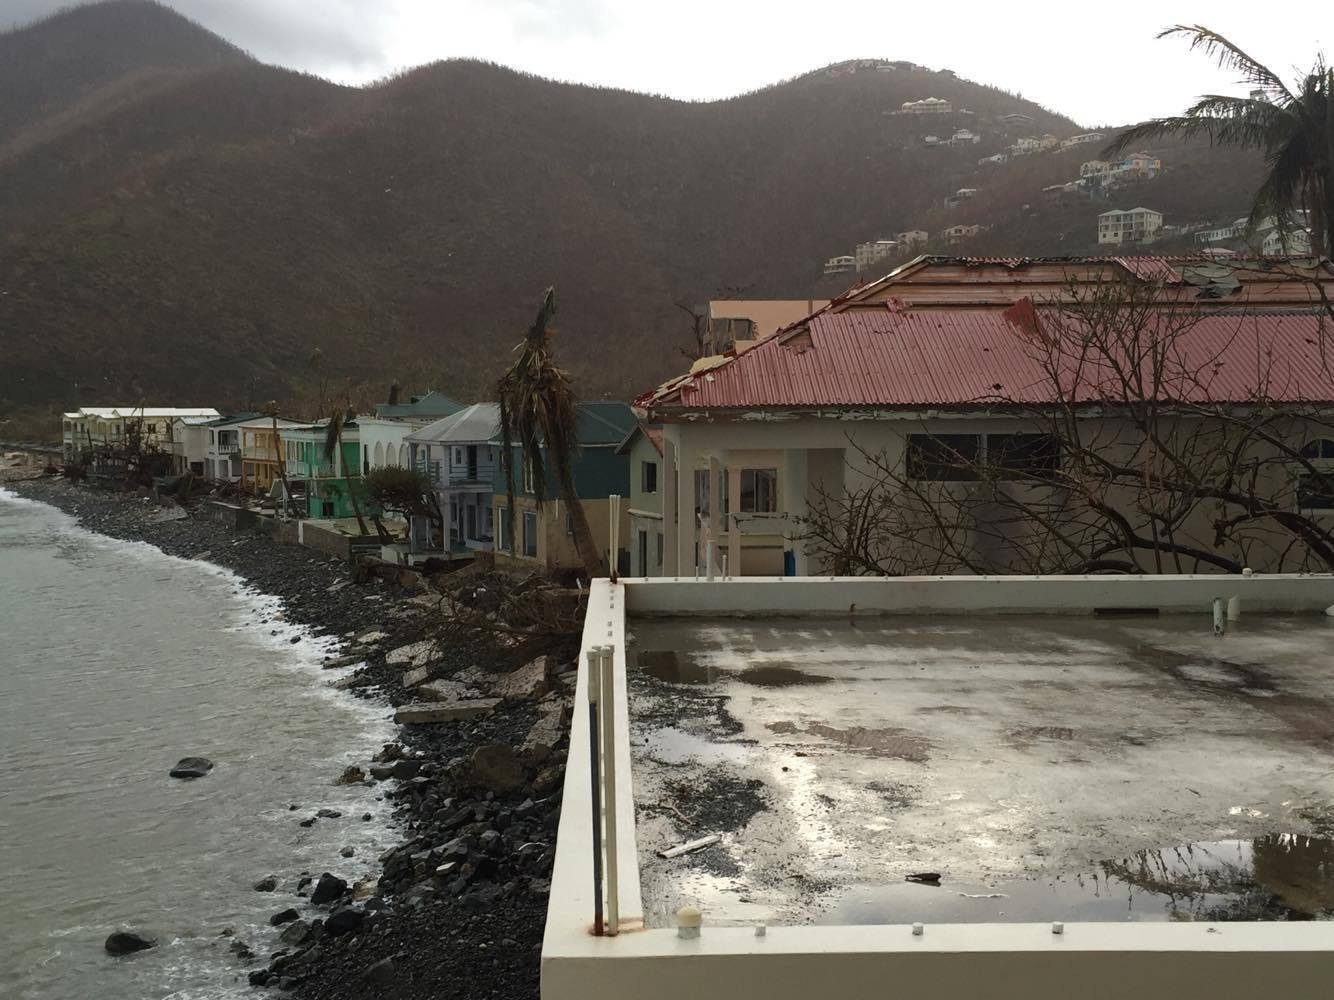 Shorelines drained in eerie effect of Hurricane Irma